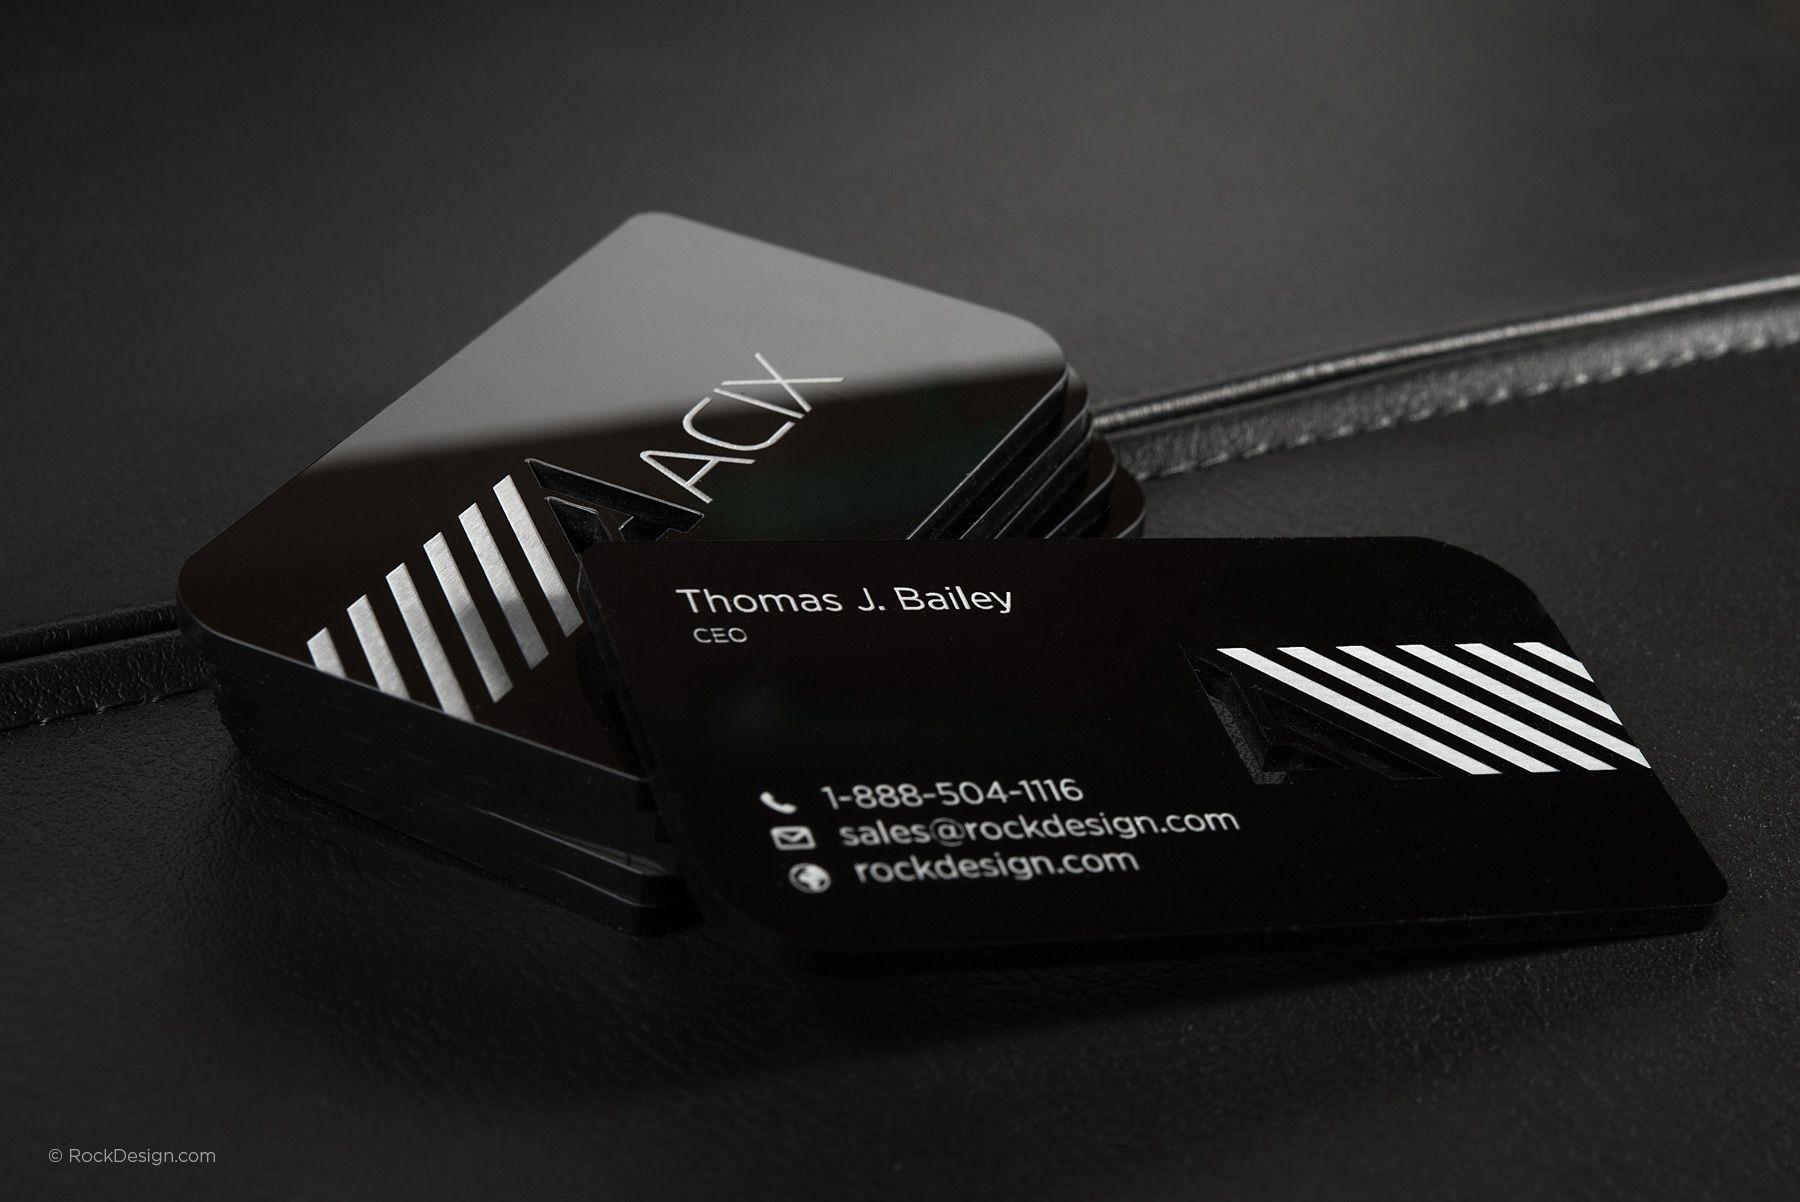 Acrylic Business Cards